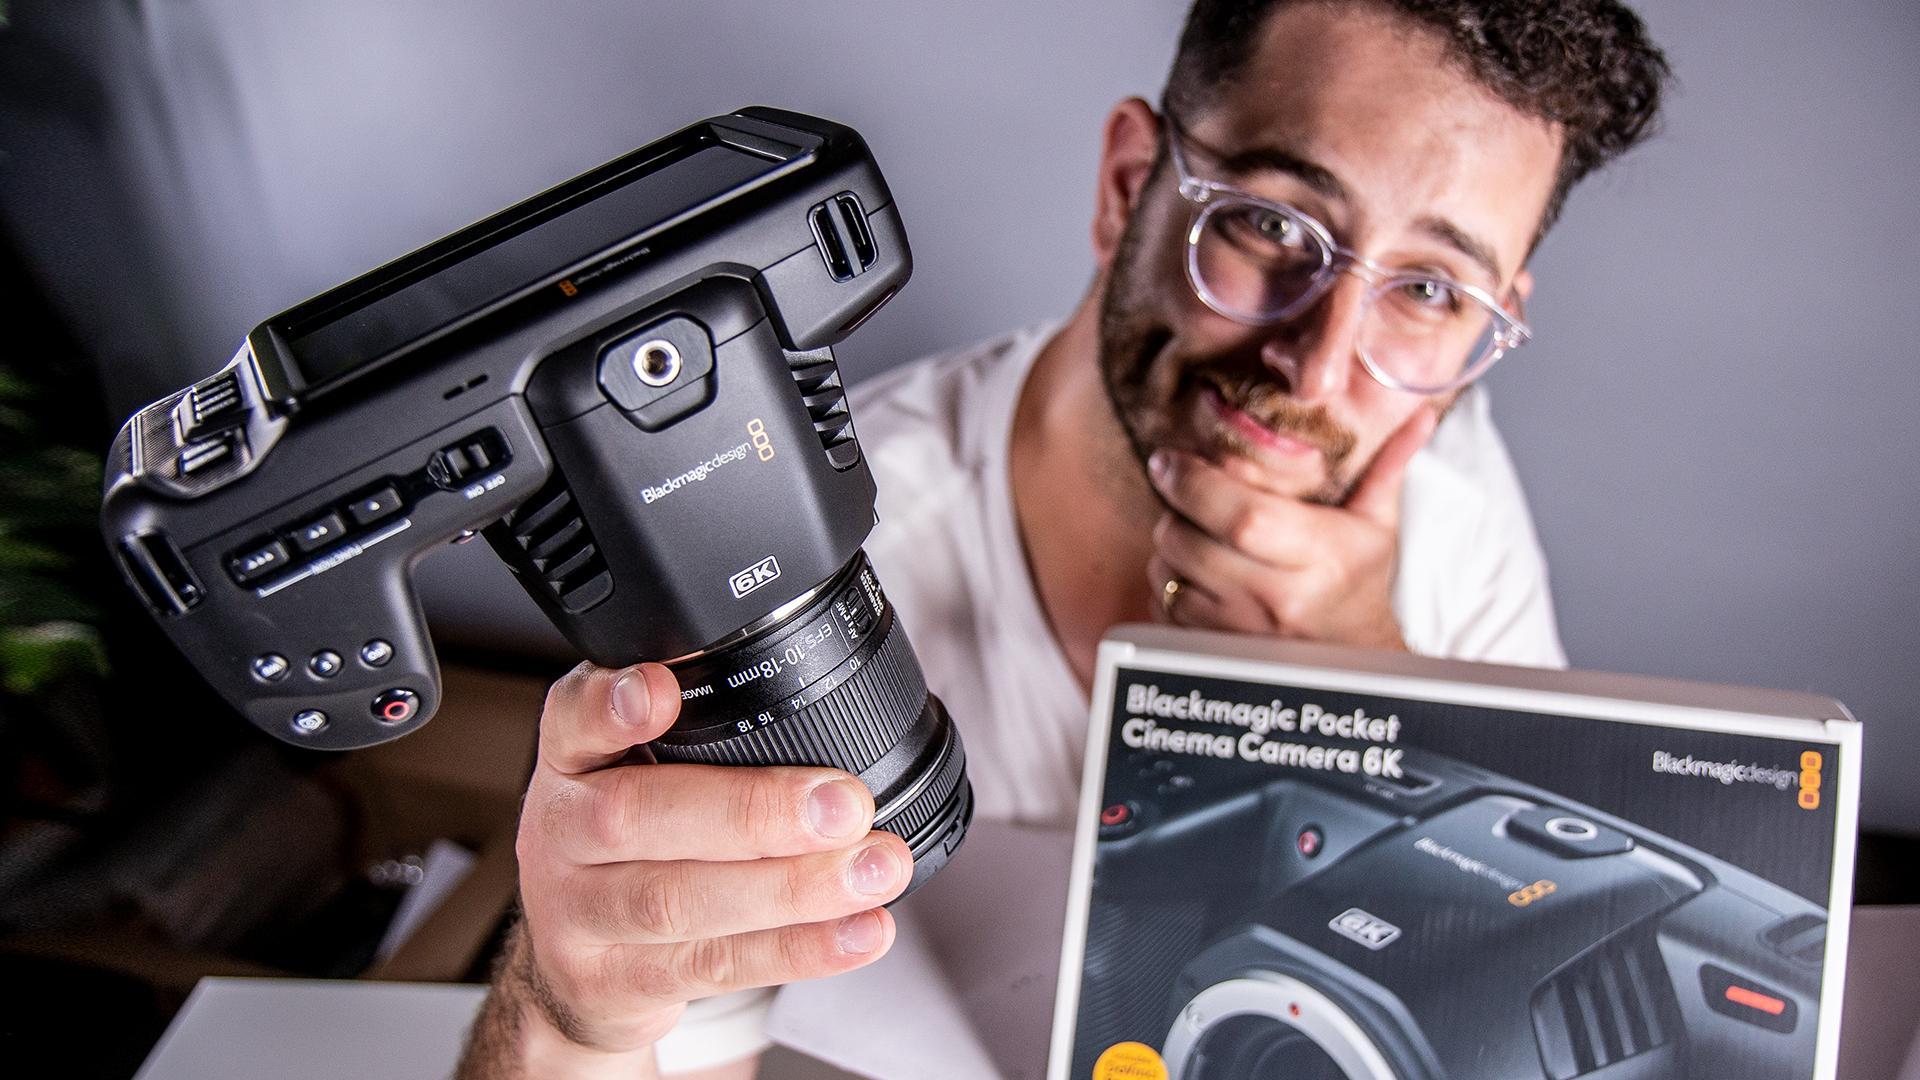 Blackmagic Pocket 6k No Prores In 6k Eoshd Com Filmmaking Gear And Camera Reviews